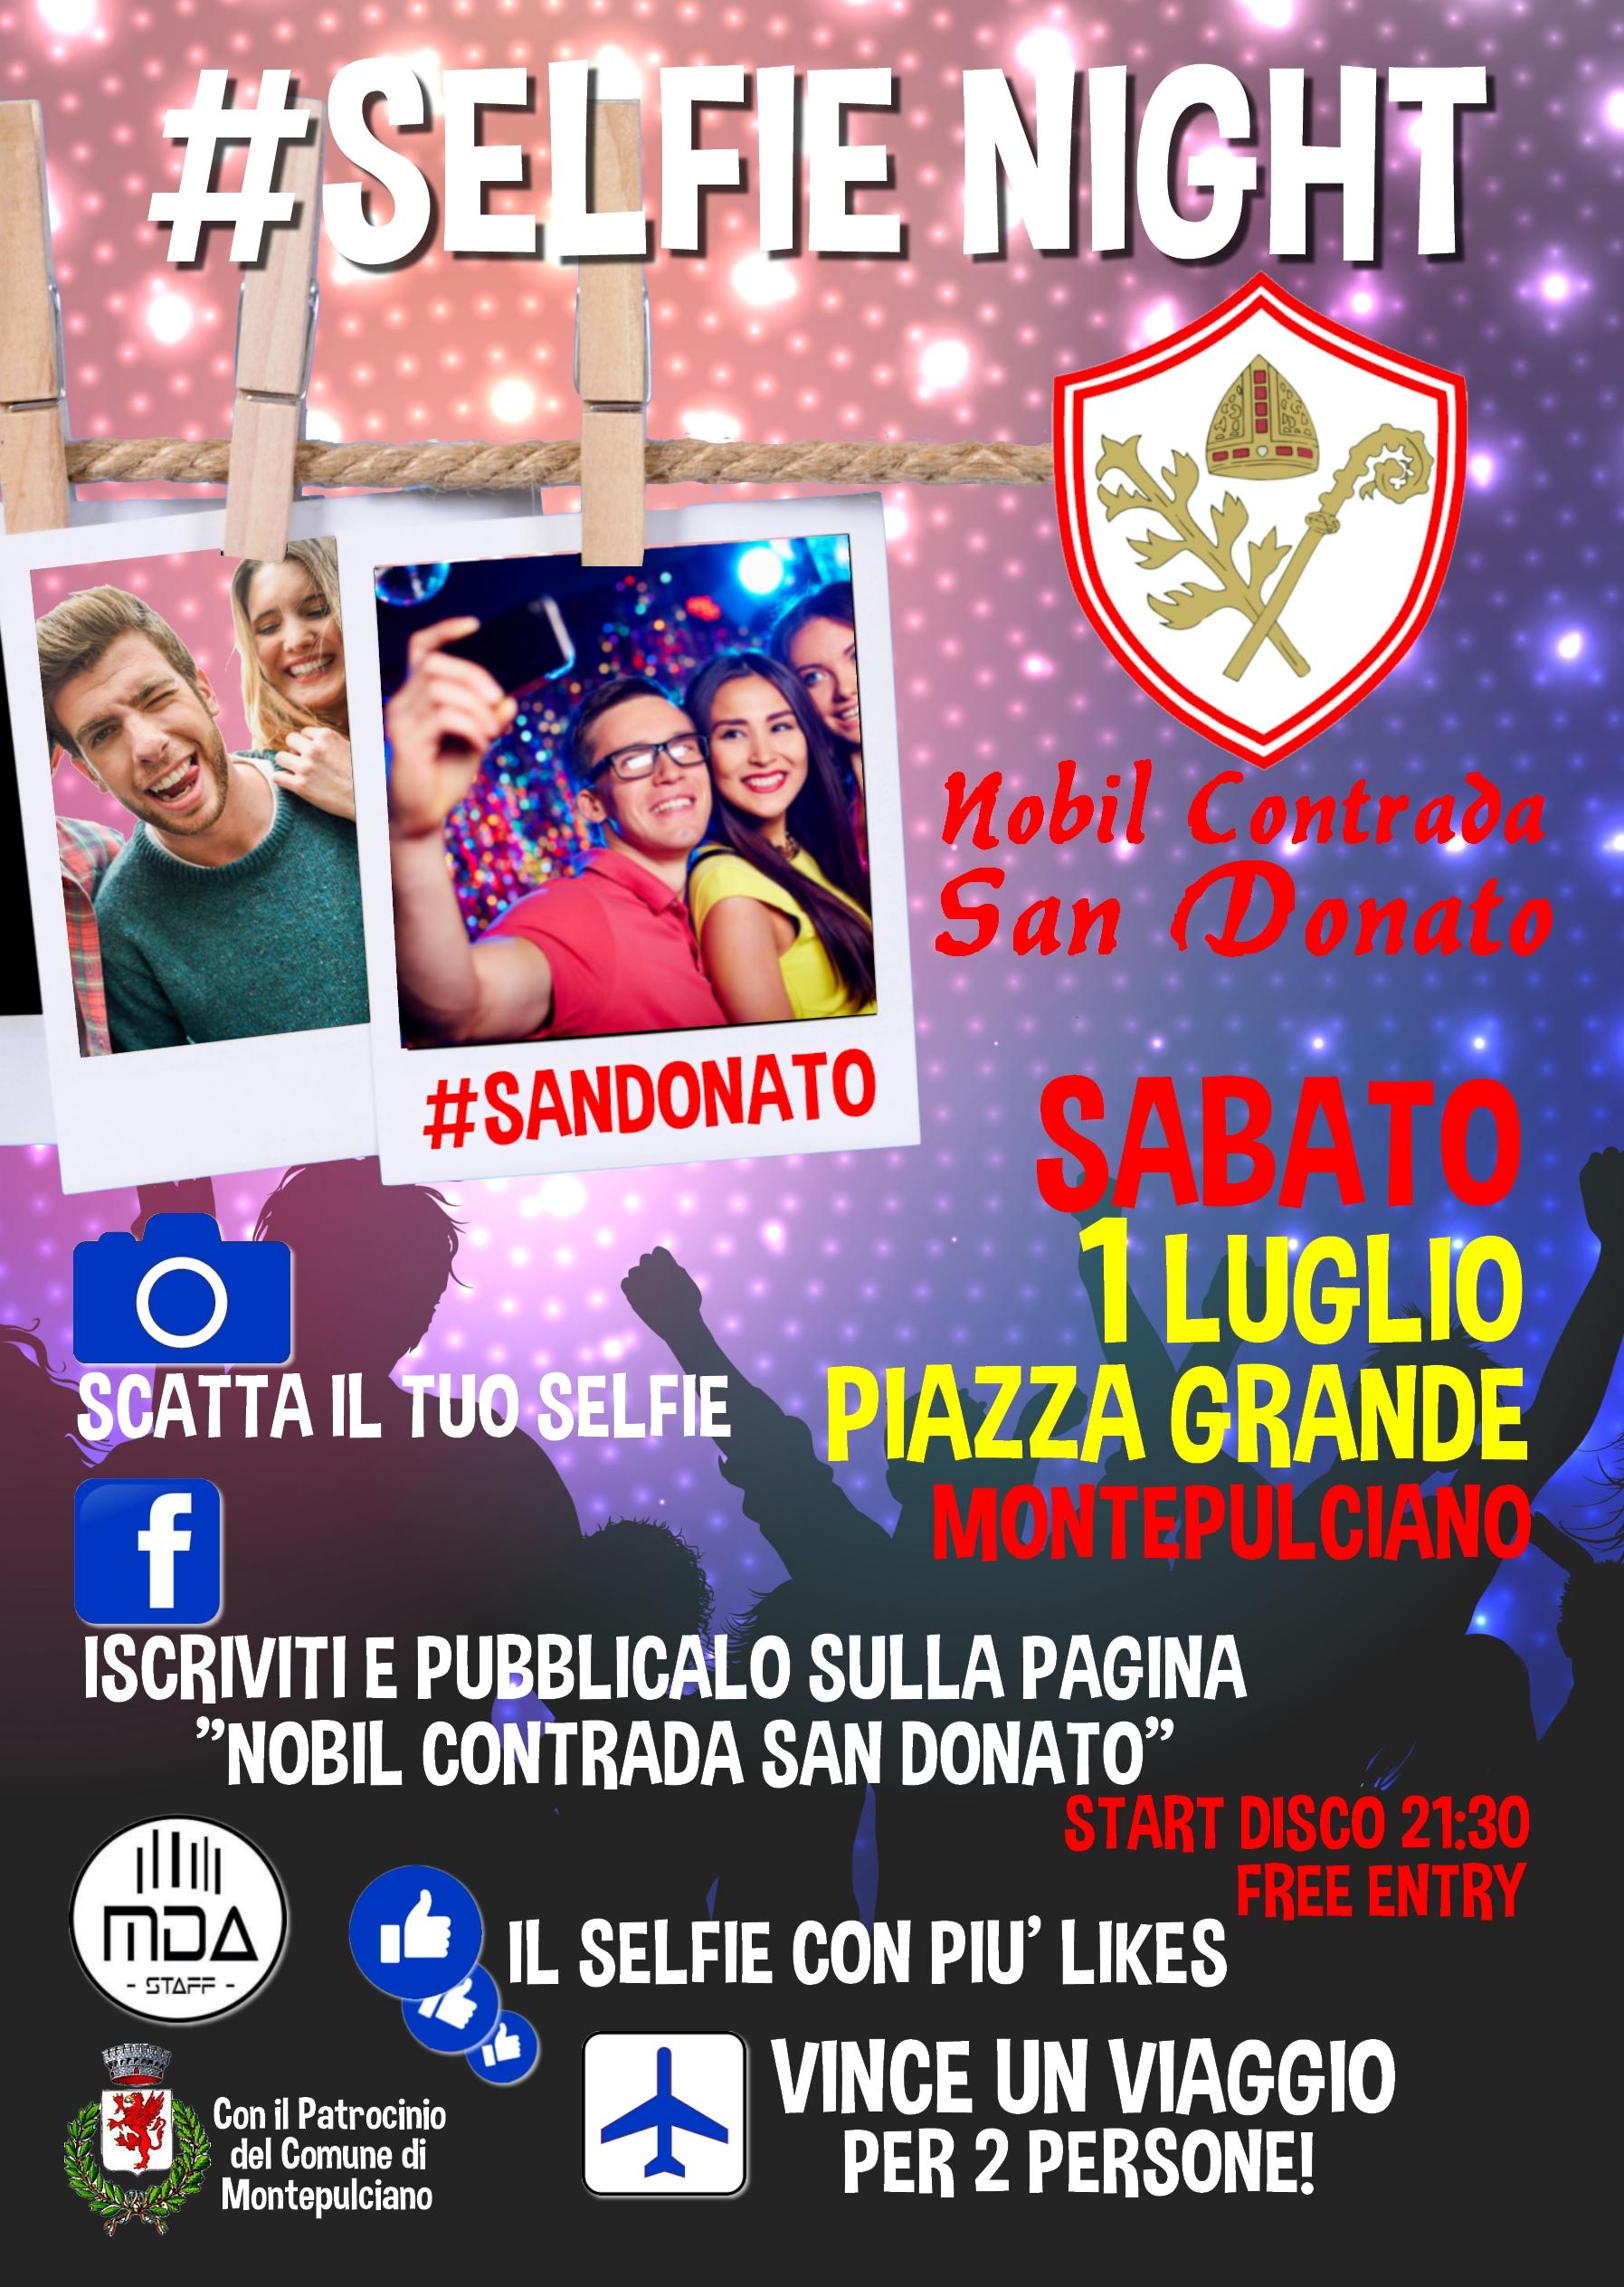 #SELFIE NIGHT Sabato 1 LUGLIO 2017 Piazza Grande Montepulciano